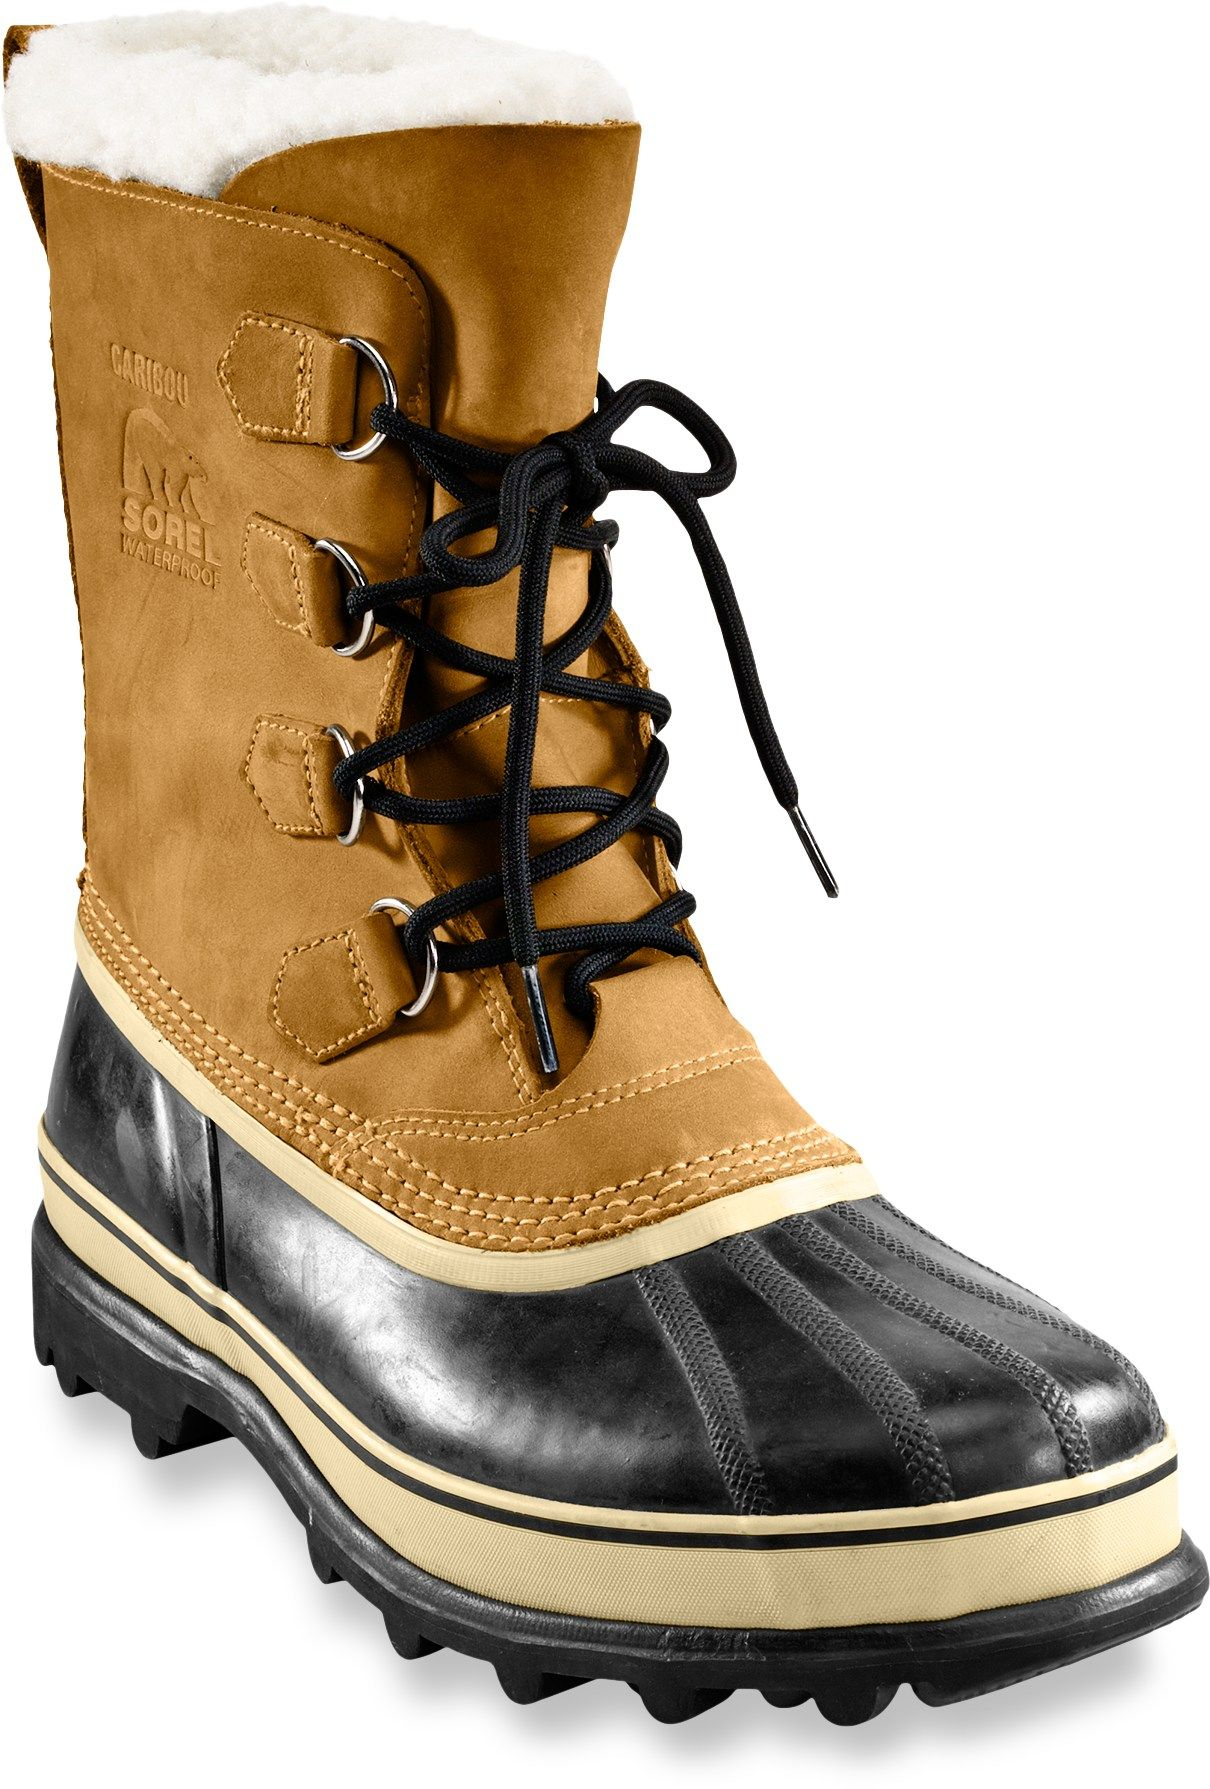 Sorel Caribou Winter Boots Men's | Zapatos, Cinturones, Botas